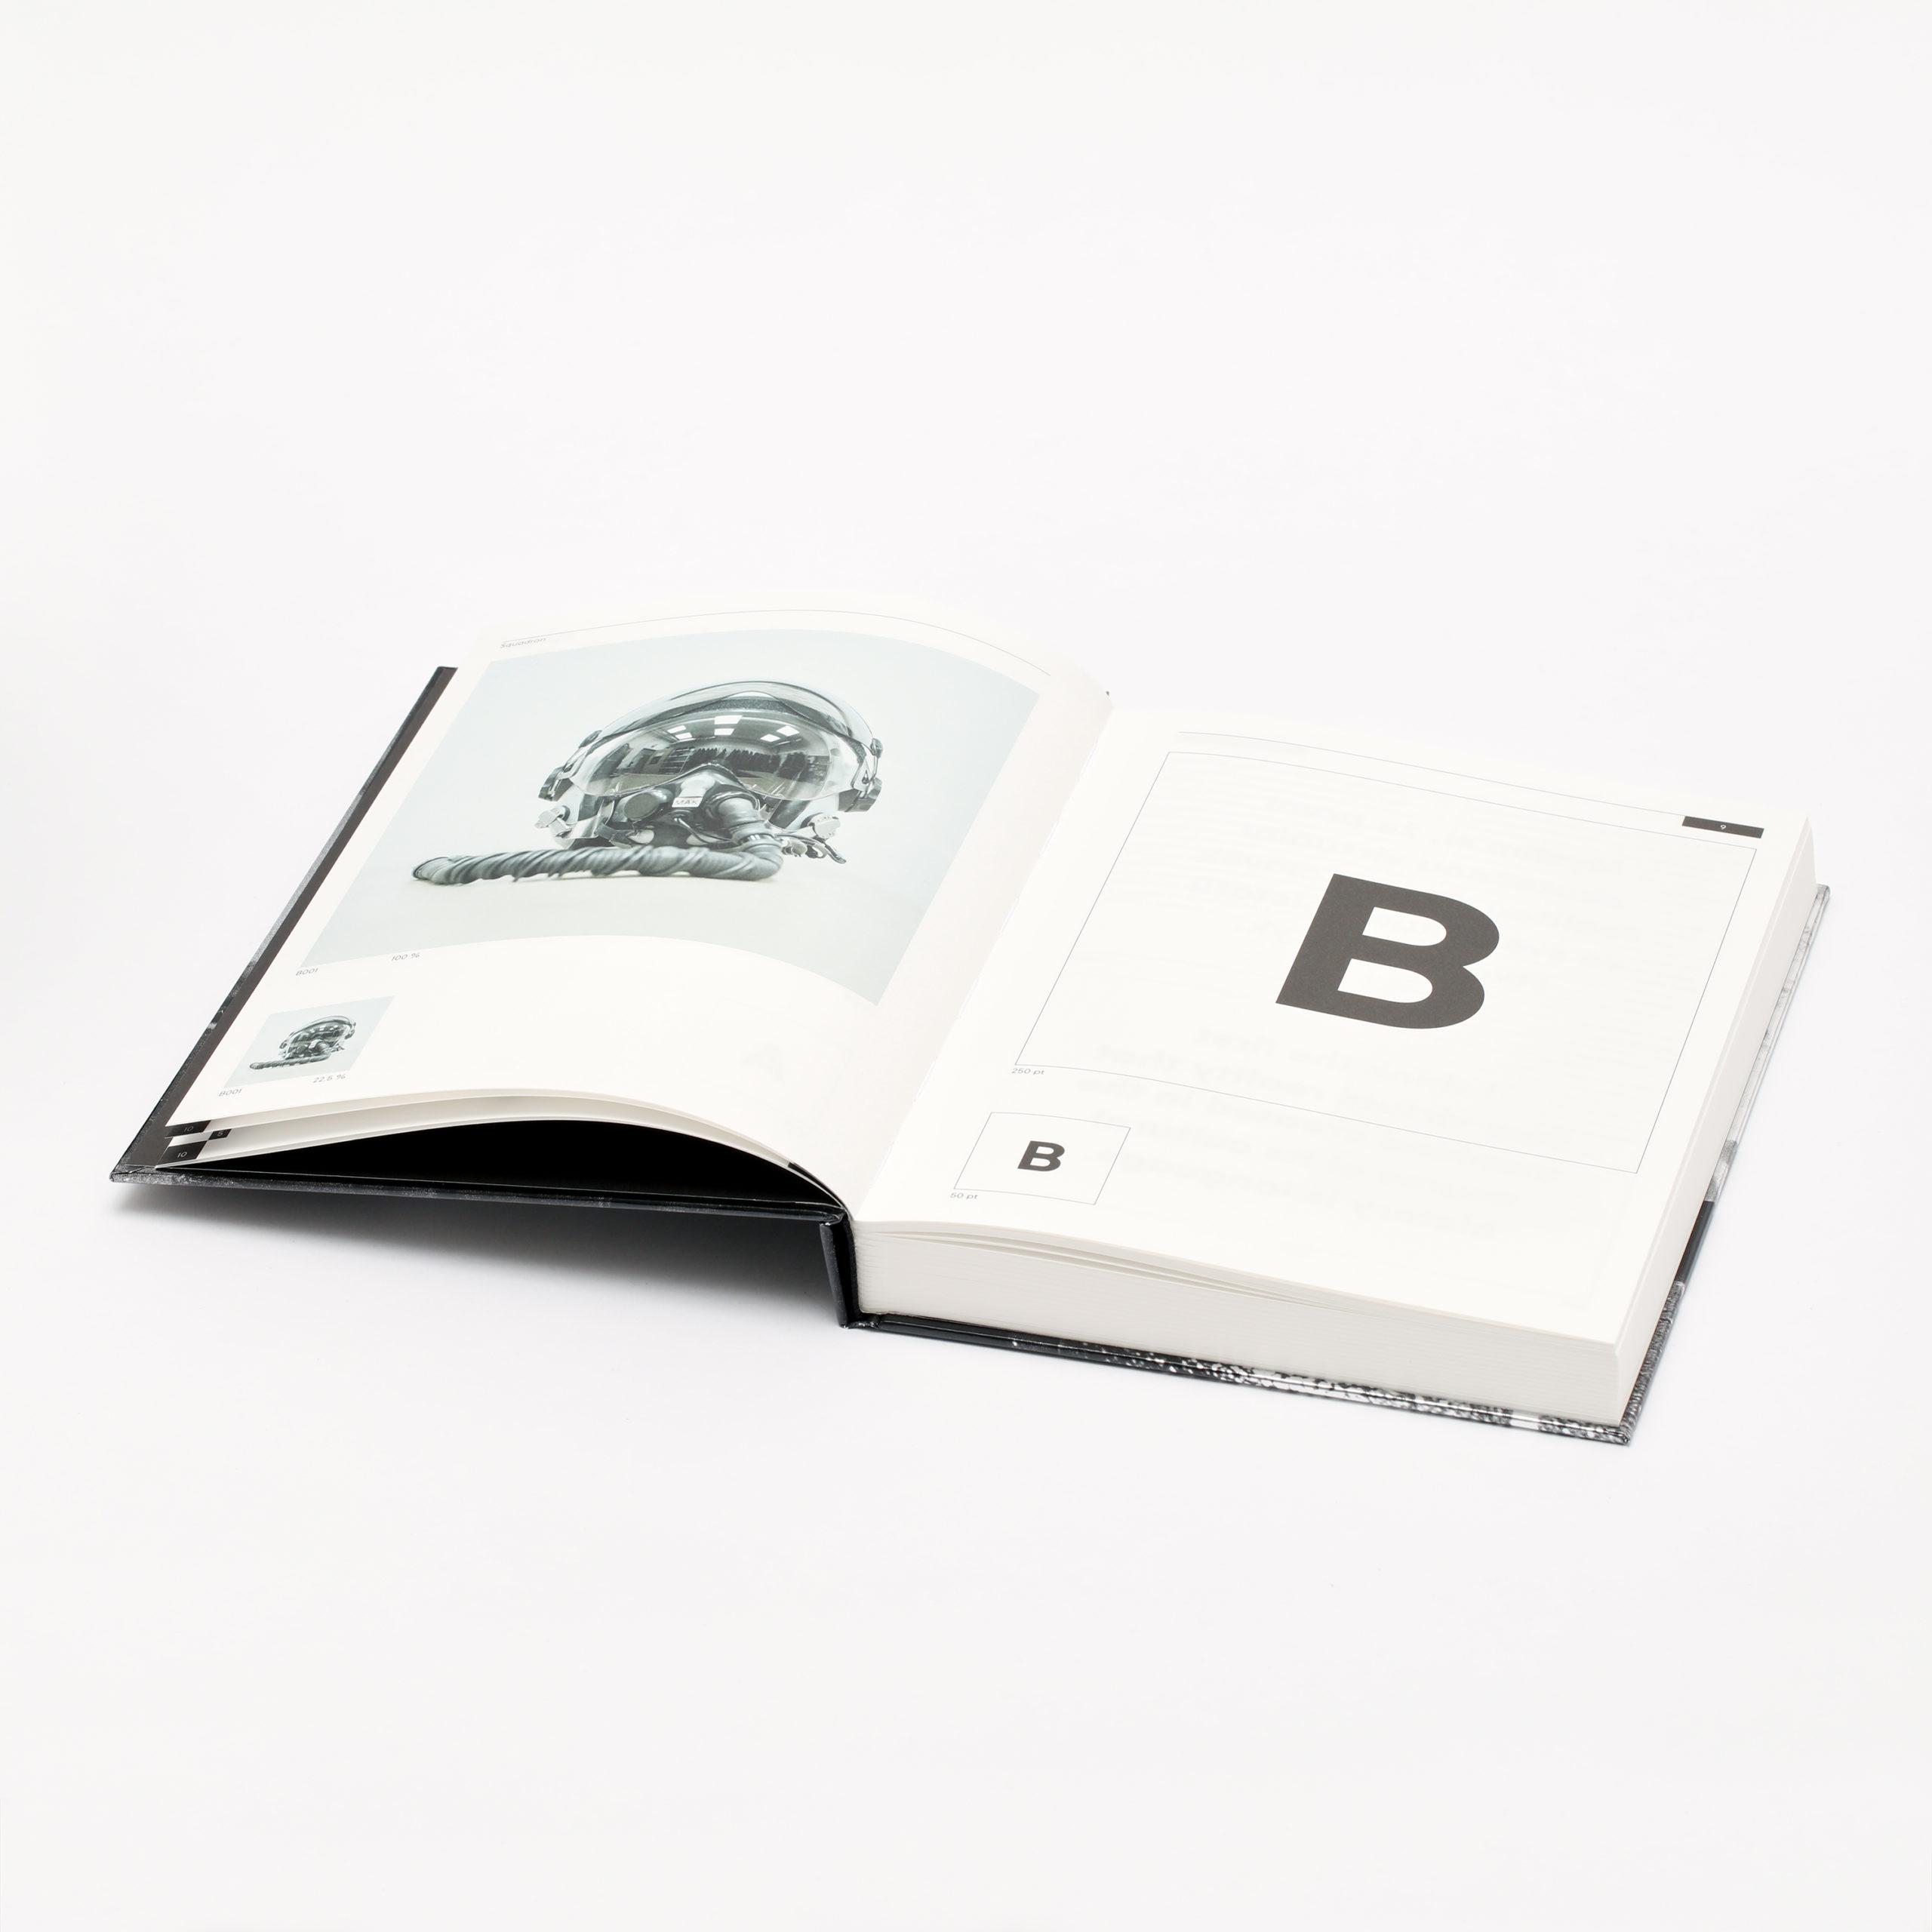 slanted-book-squadron-04